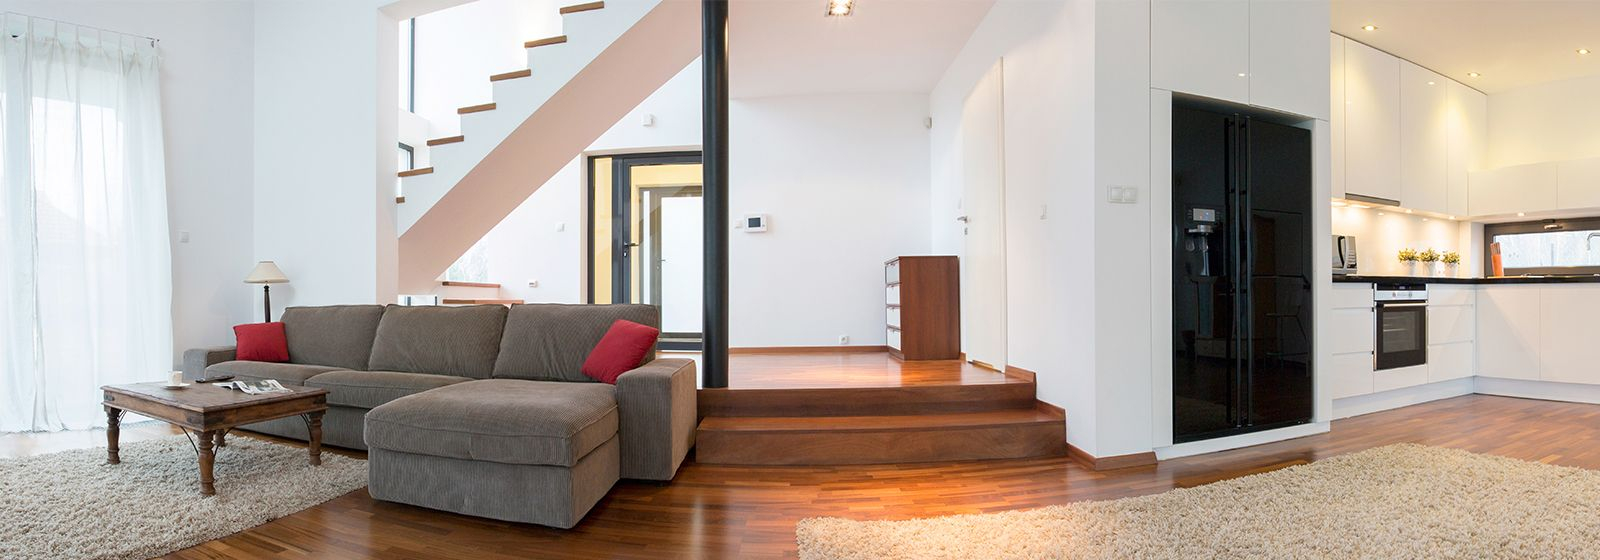 8 ways to save energy around the home